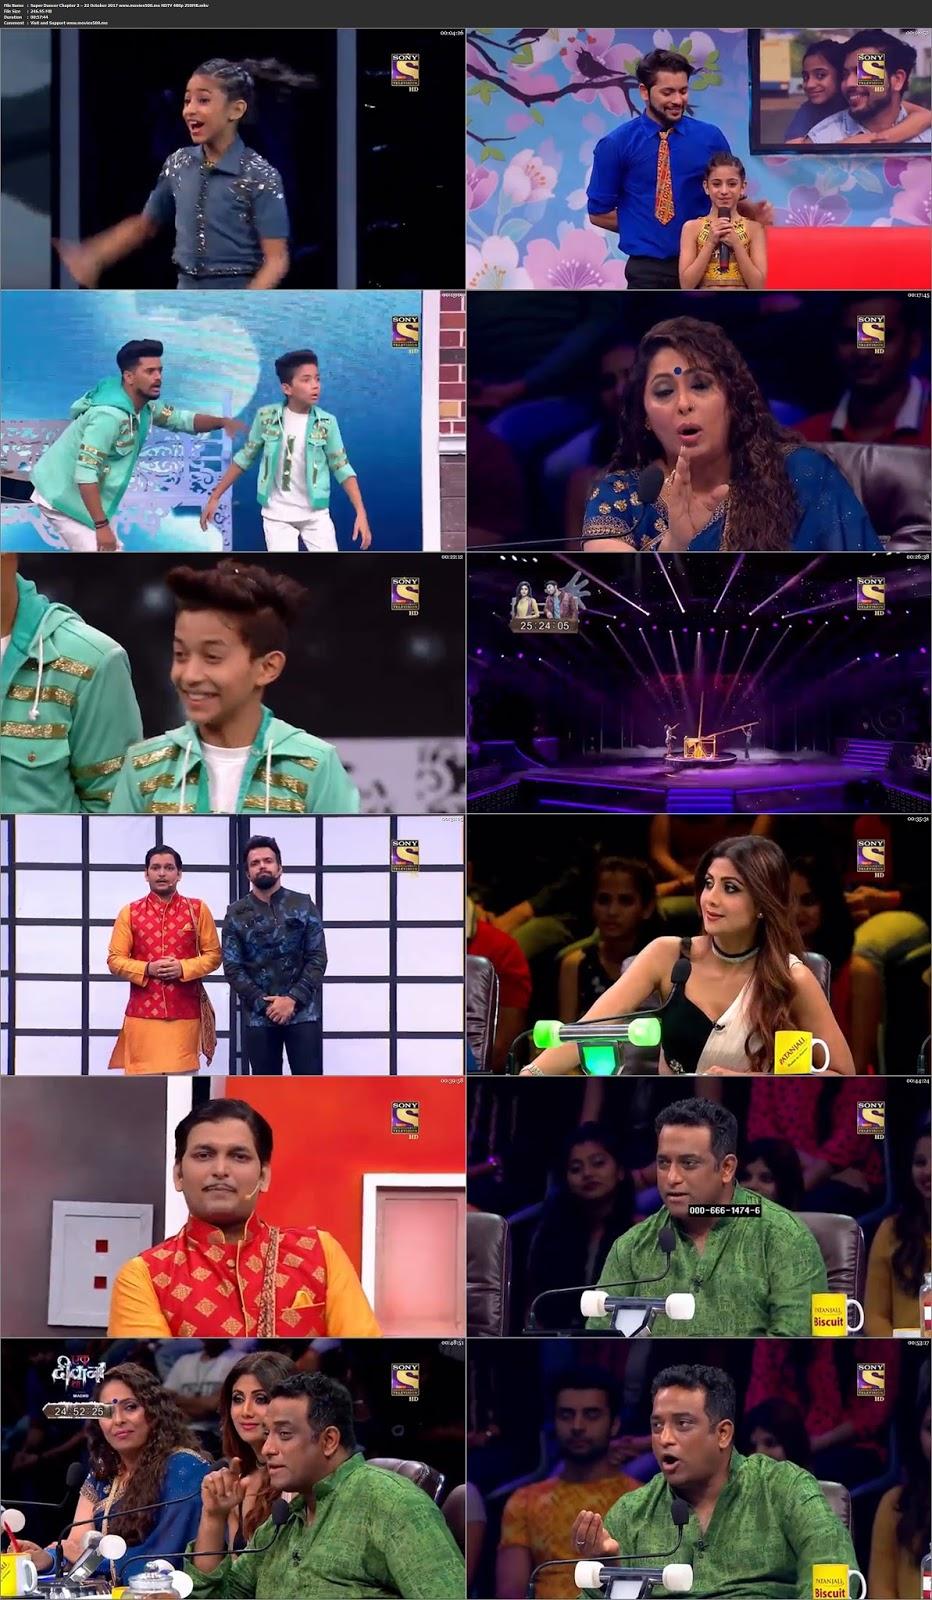 Super Dancer Chapter 2 2017 22 October 246MB HDTV 480p at doneintimeinc.com